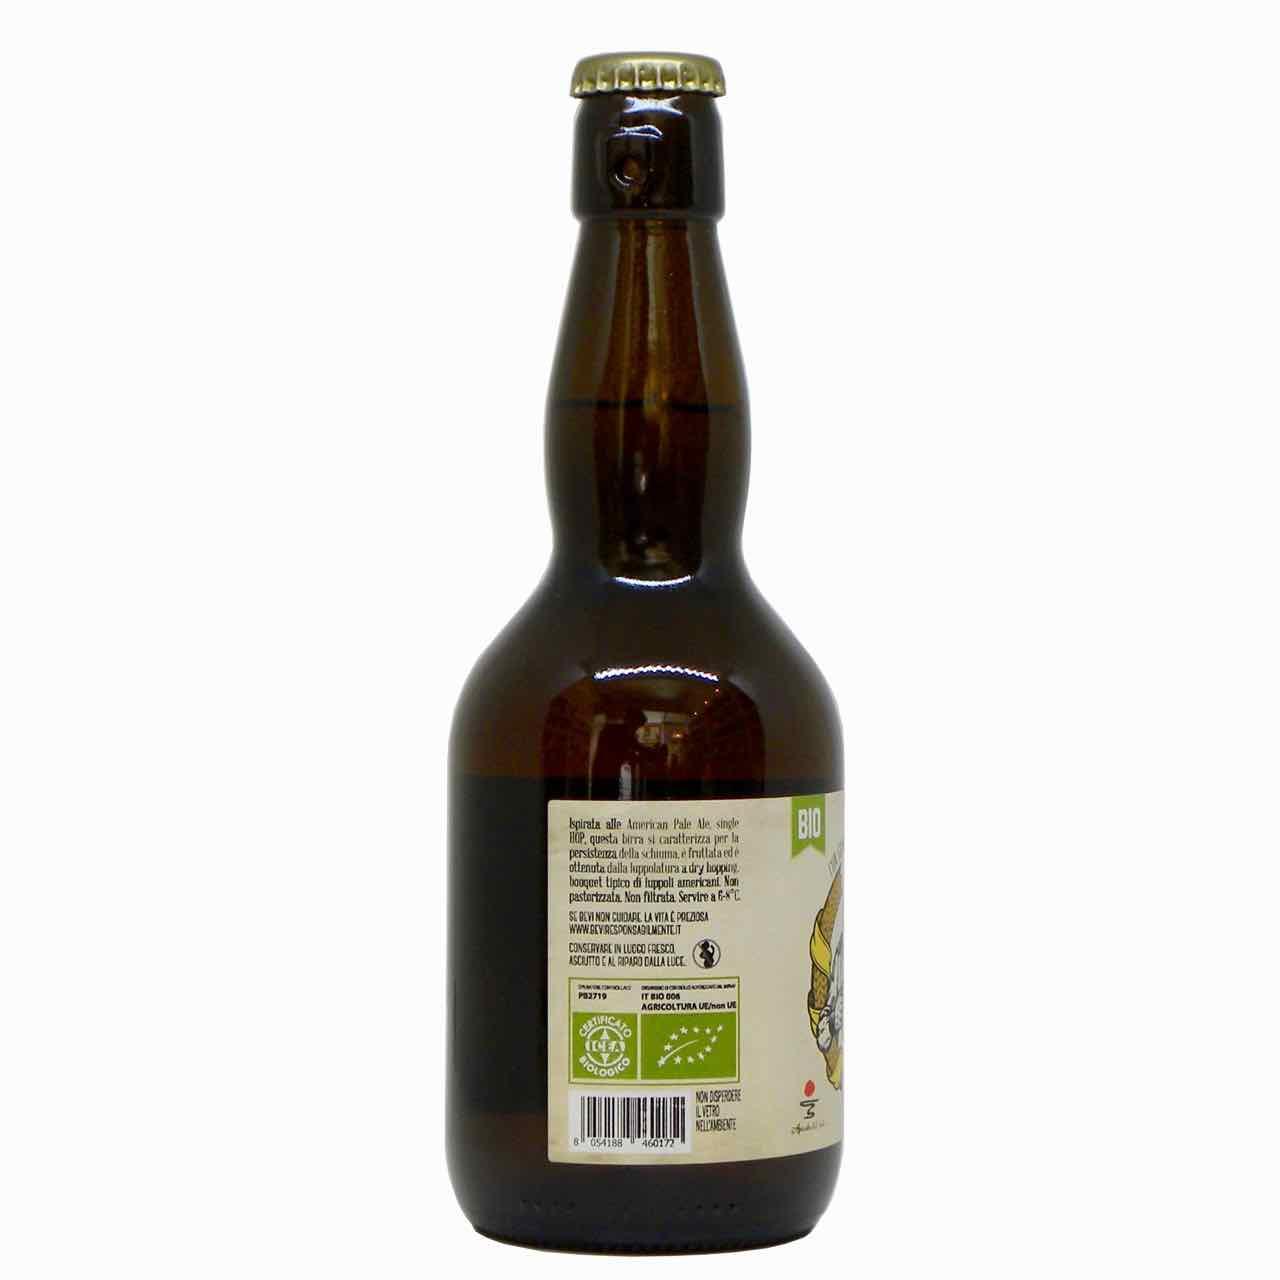 birra bionda artigianale lato – artisan beer – Agricola del Sole – Gustorotondo Italian food boutique – I migliori cibi online – Best Italian food online – spesa online